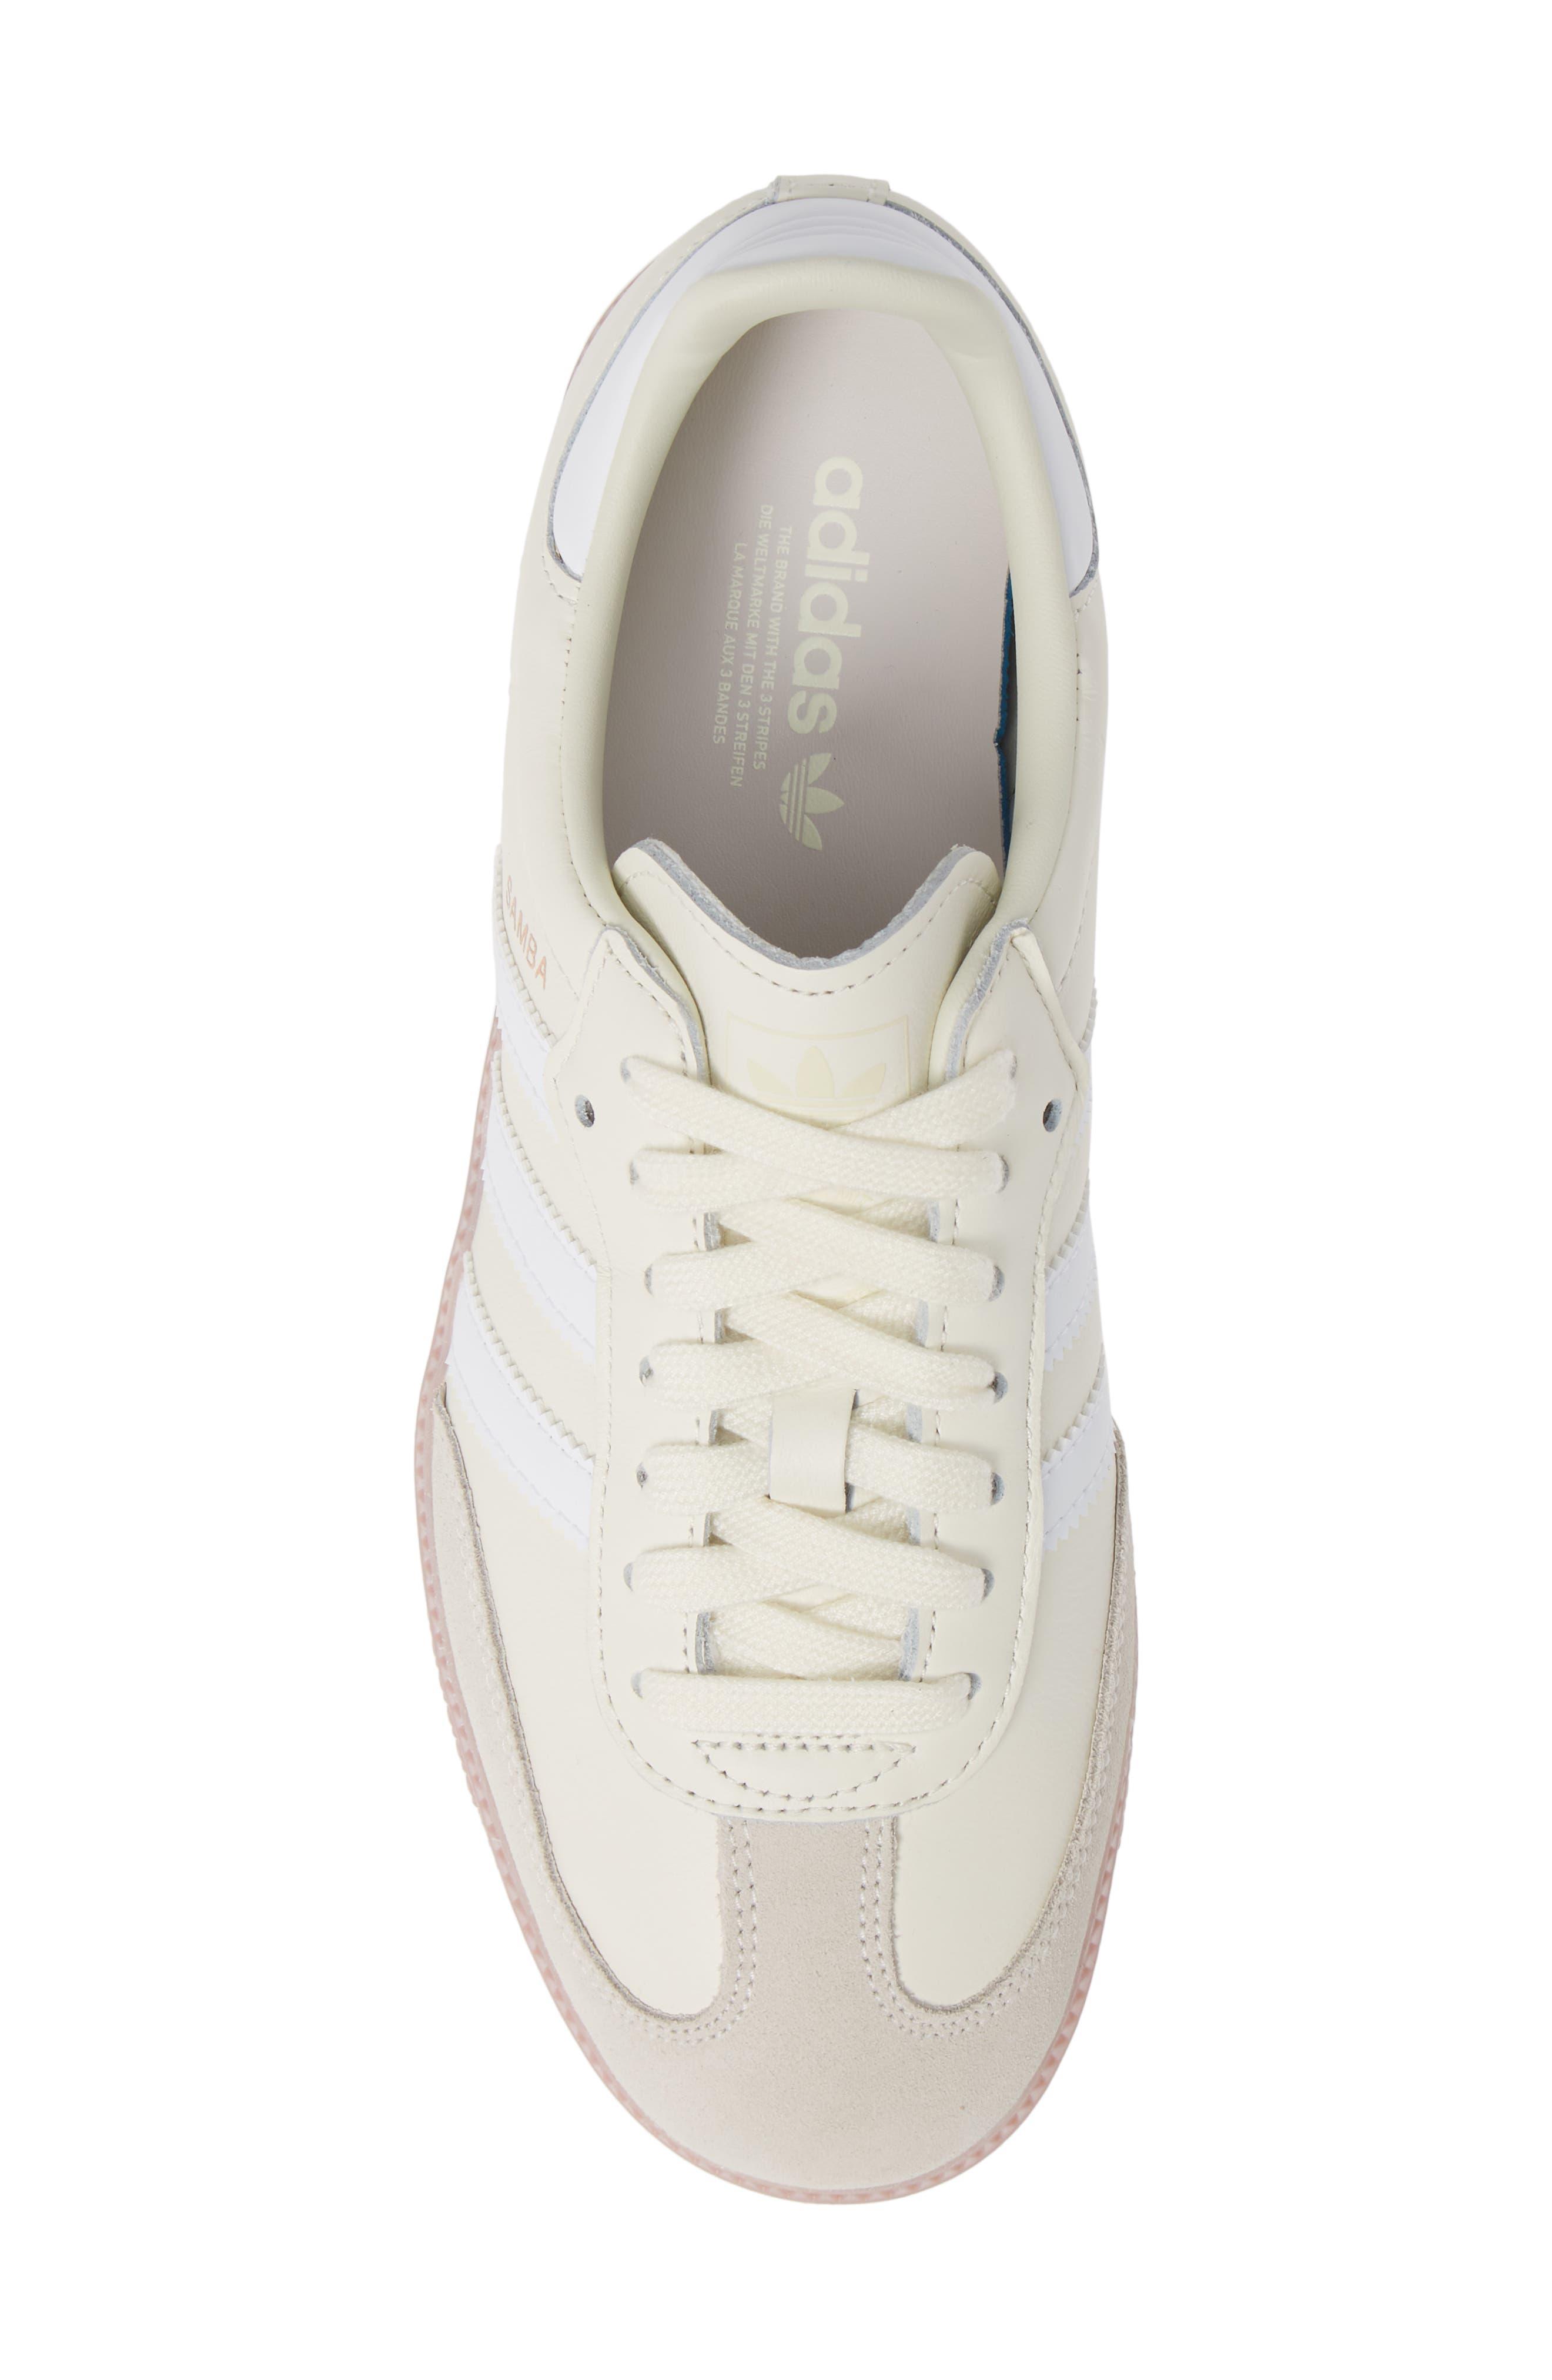 Samba Sneaker,                             Alternate thumbnail 5, color,                             OFF WHITE/ WHITE/ SOFT VISION